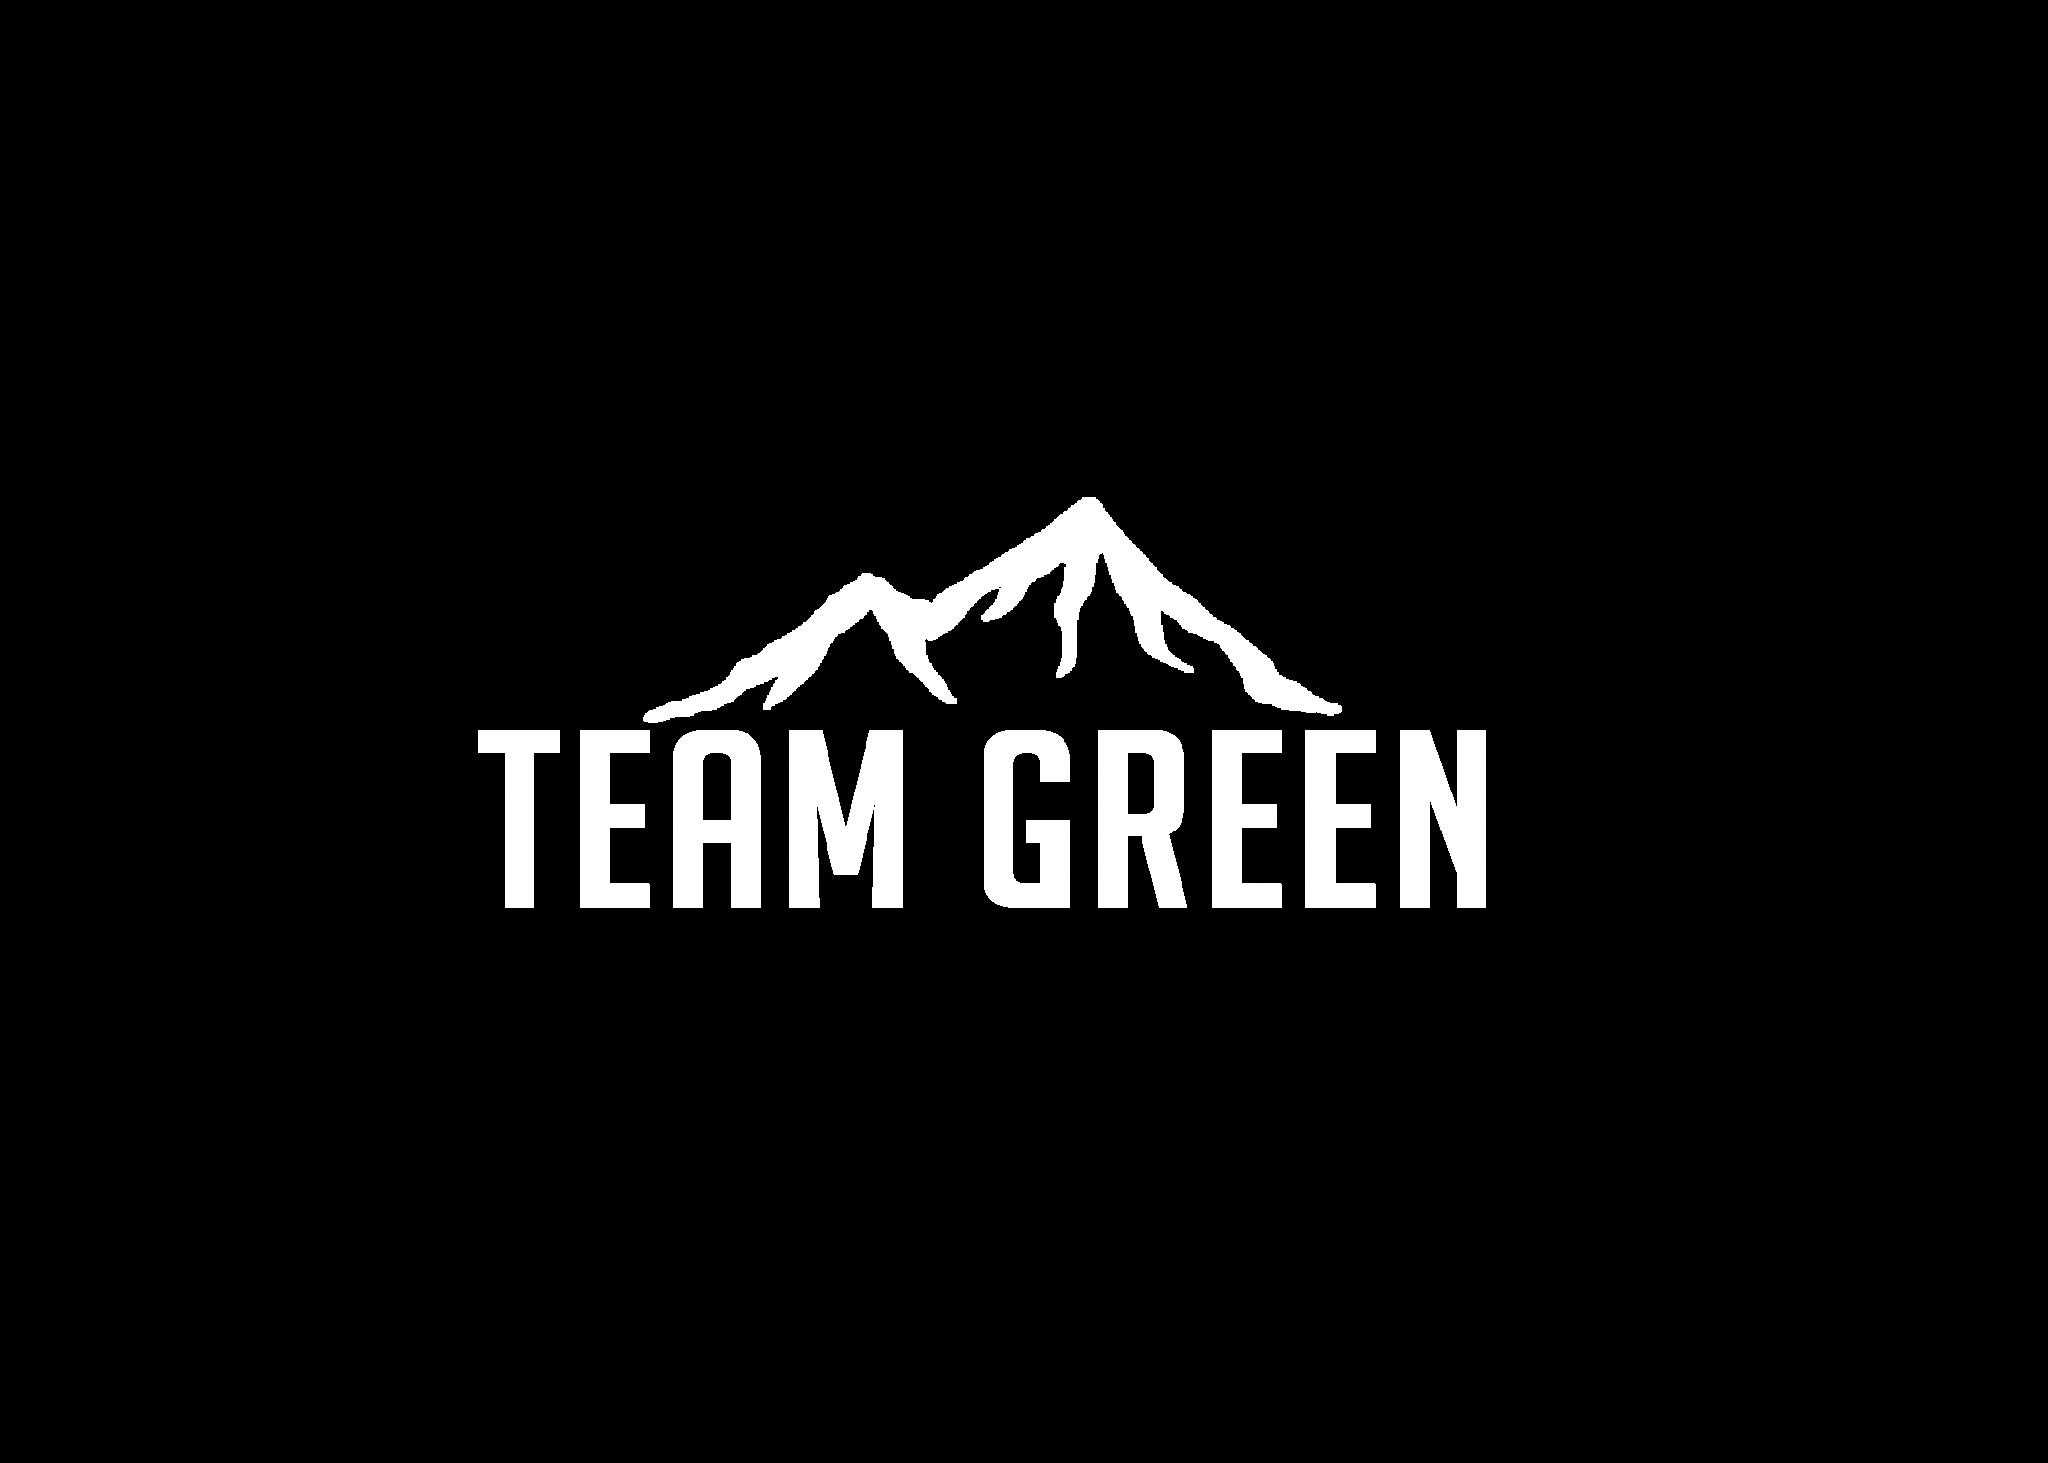 Team Green